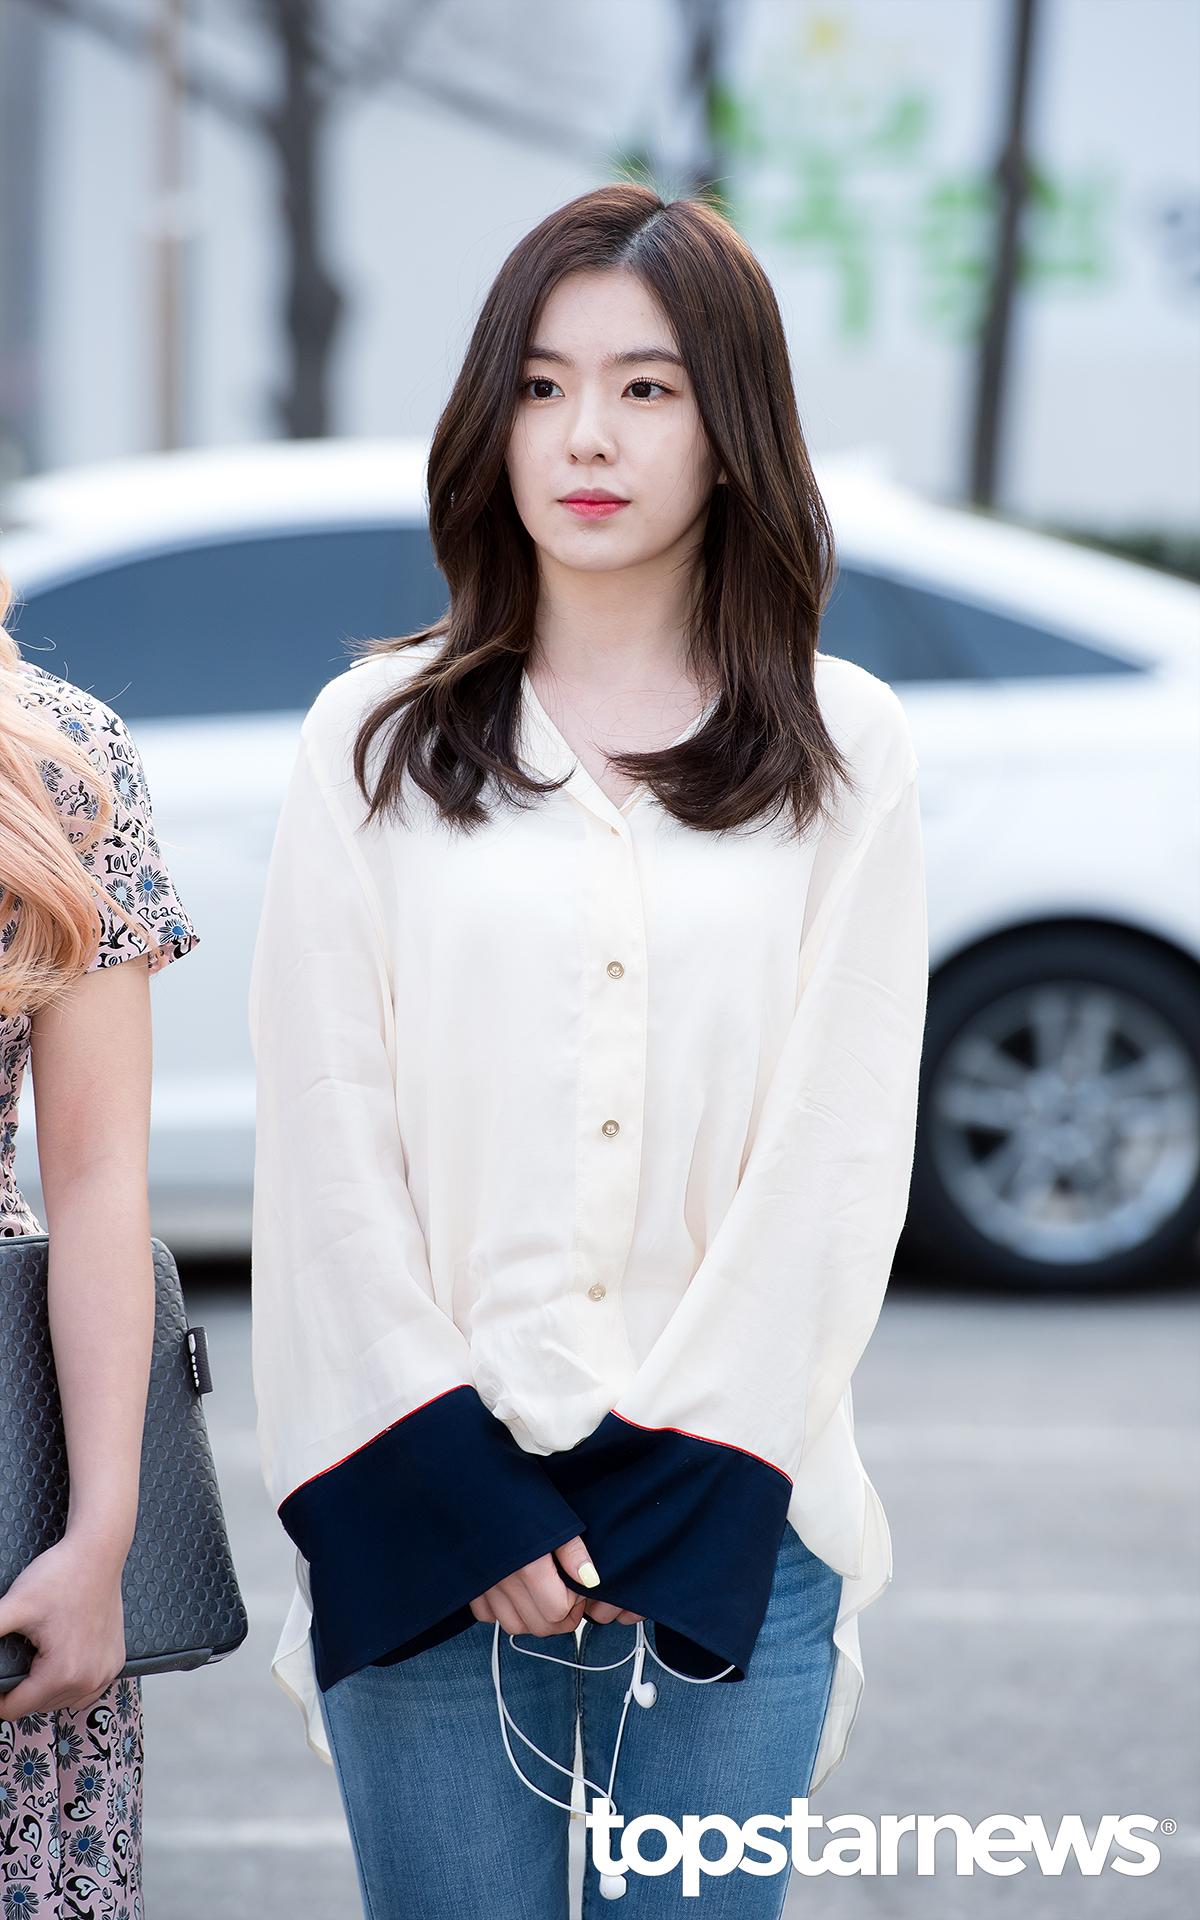 ♡ Red Velvet Irene  「Irene 的臉型很精緻,比例也非常好。」、「Irene 的眼睛屬於細長型,也是現在很多女生喜歡的感覺。」